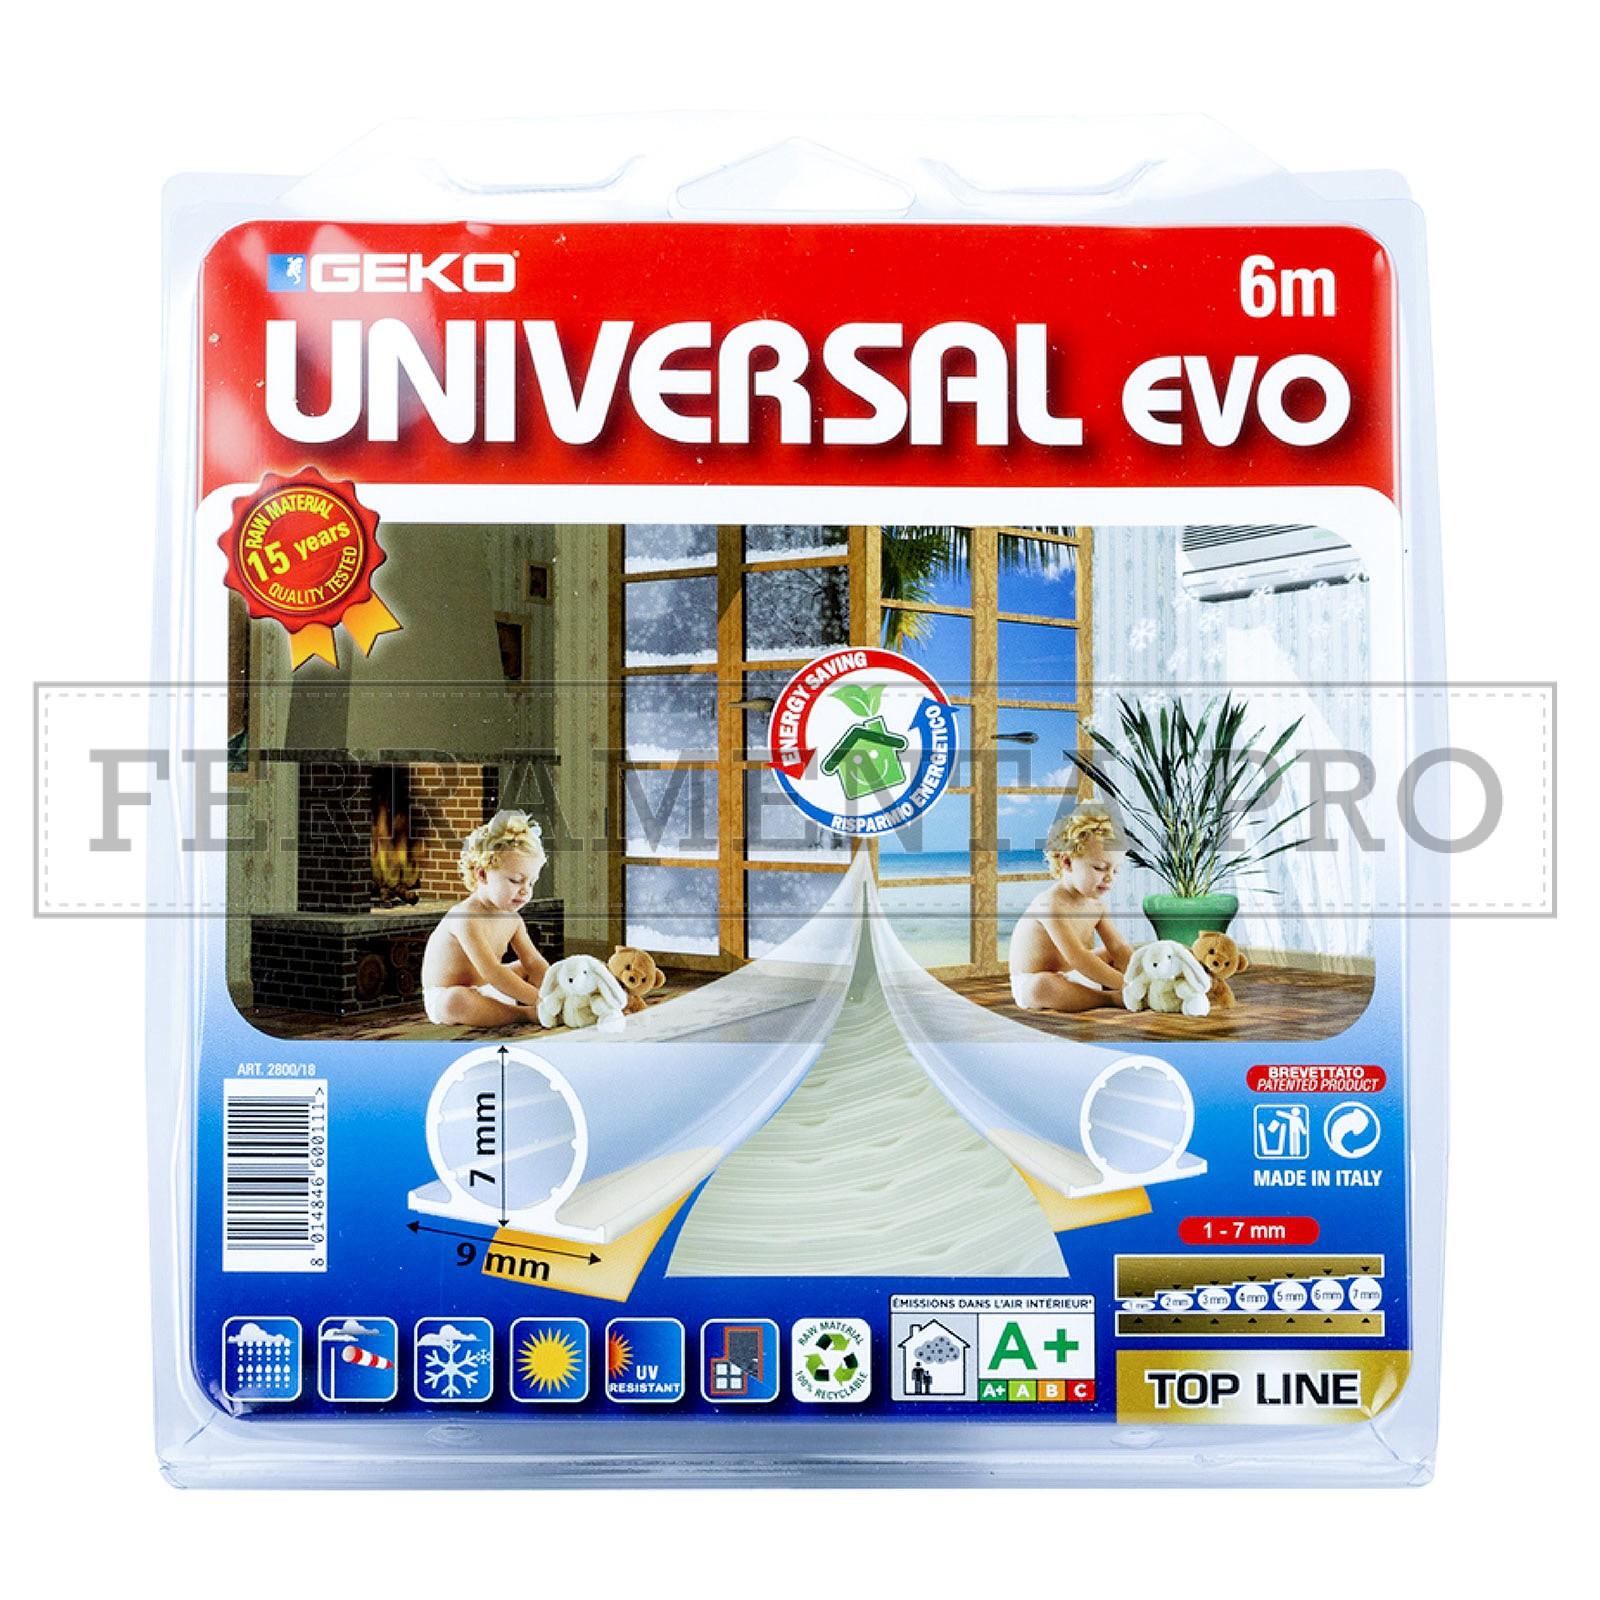 Parafreddo Universal Evo Geko Silicone 1-7Mm 6M Marrone